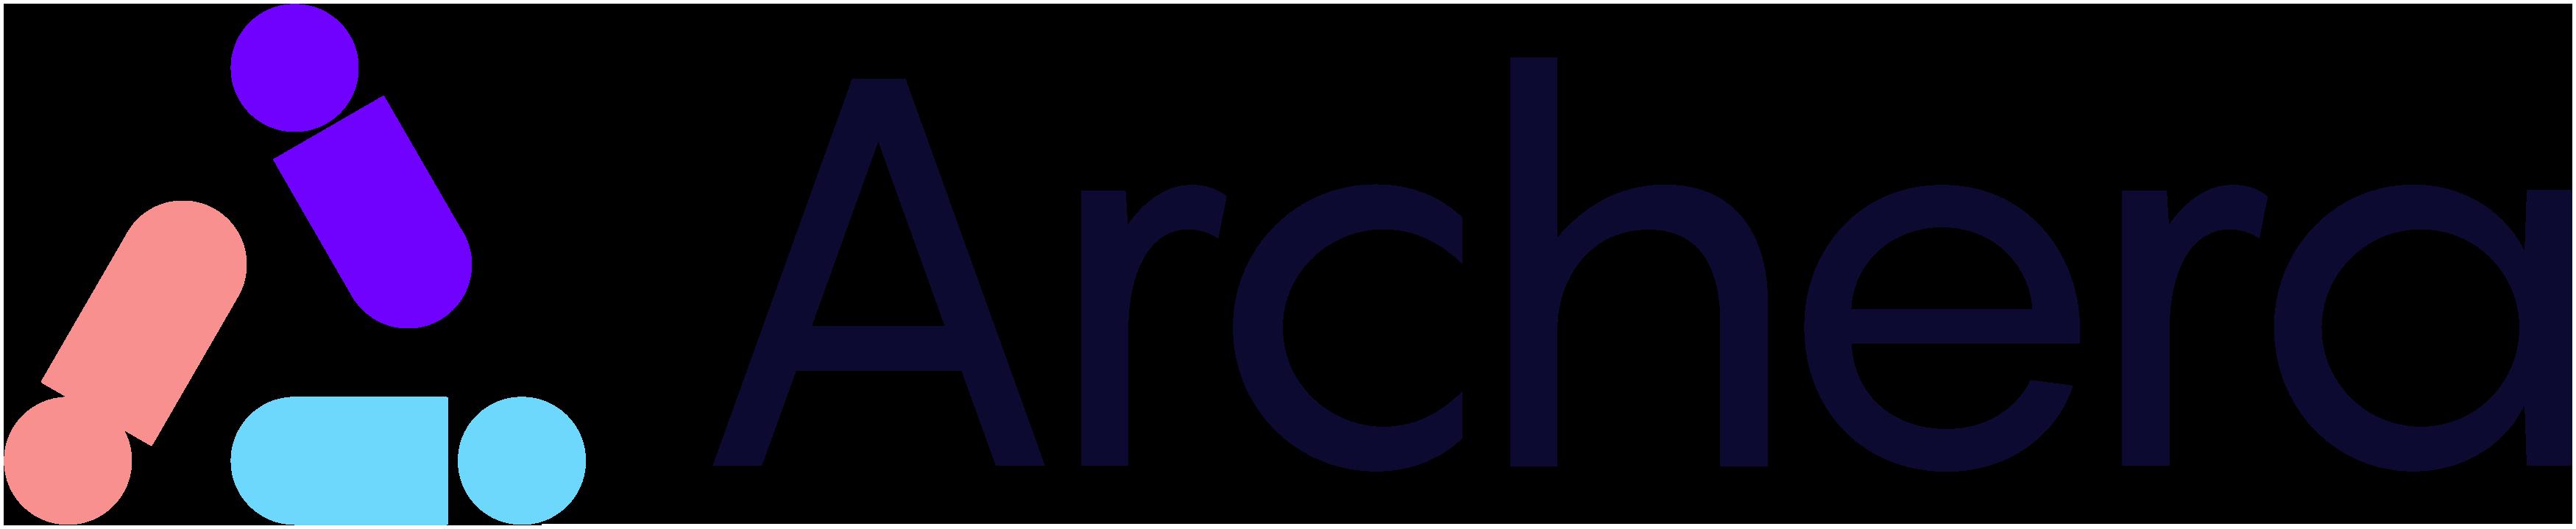 Archera logo